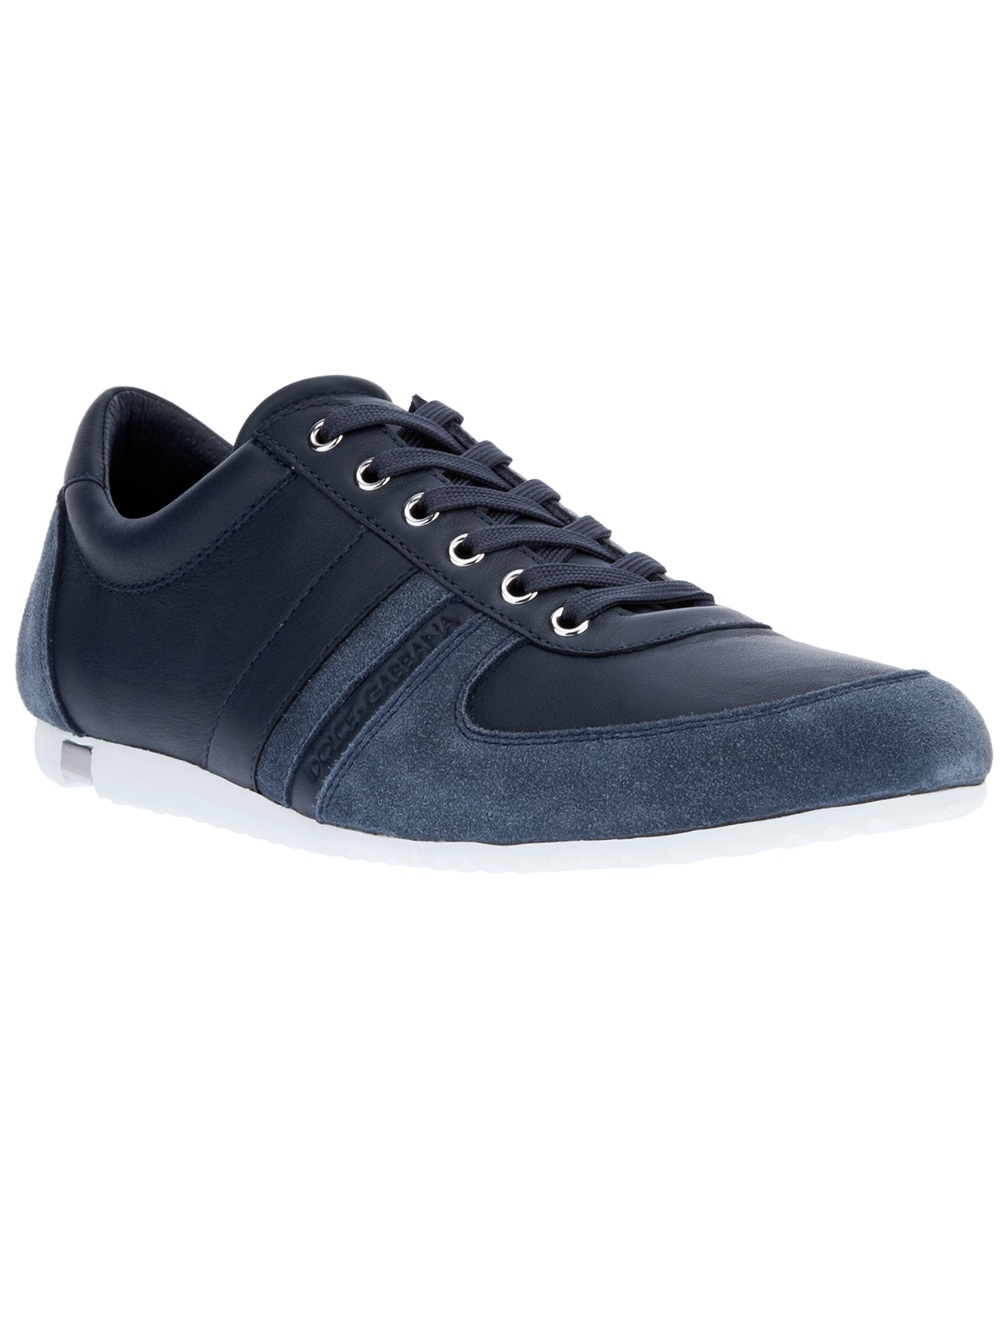 dolce gabbana australia sneaker in blue for men lyst. Black Bedroom Furniture Sets. Home Design Ideas